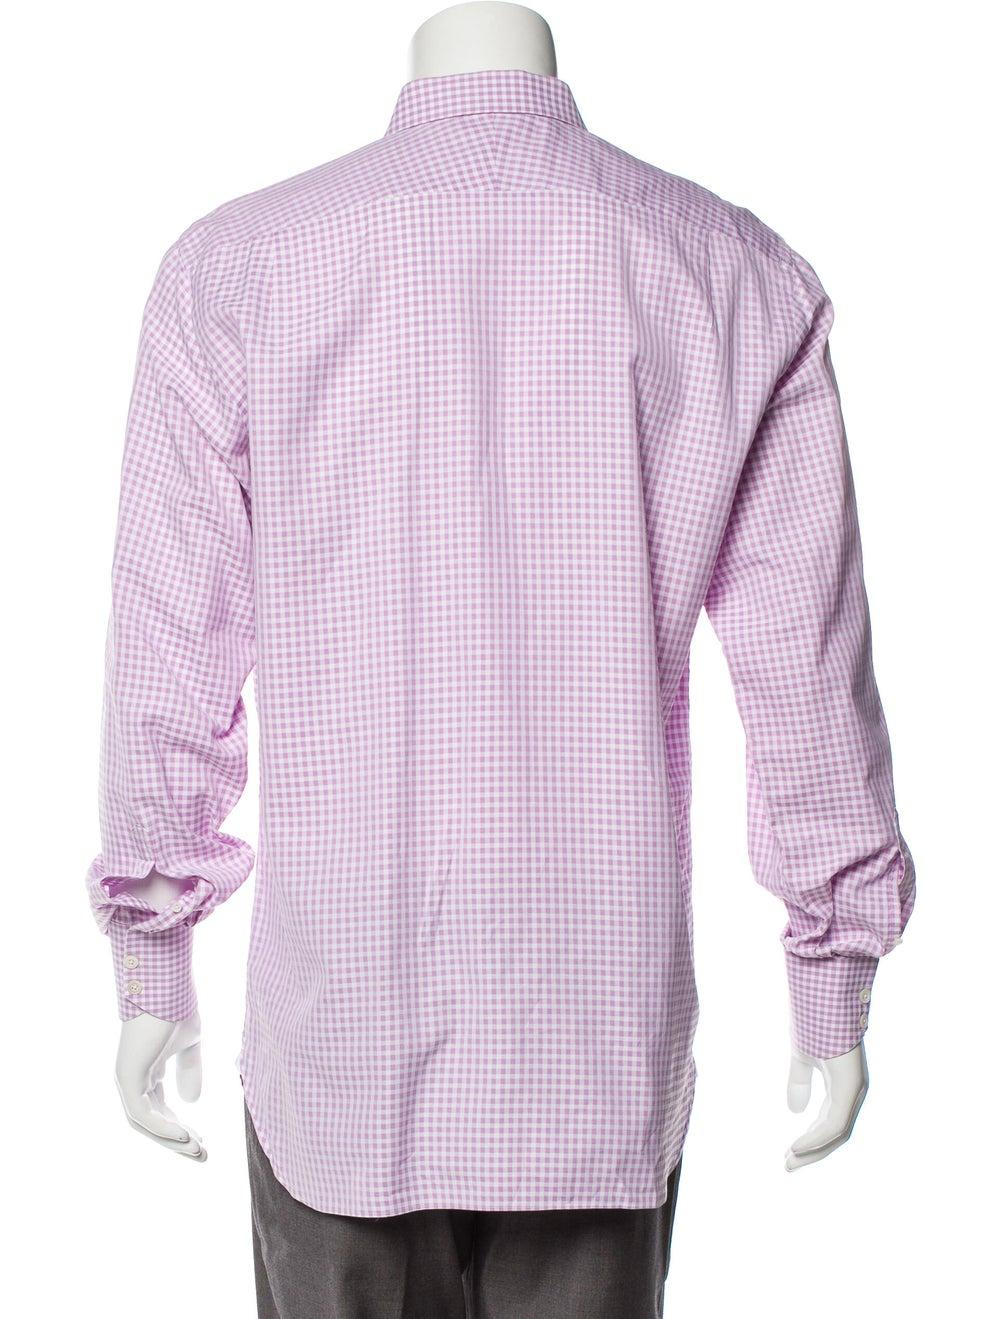 Tom Ford Gingham Dress Shirt pink - image 3